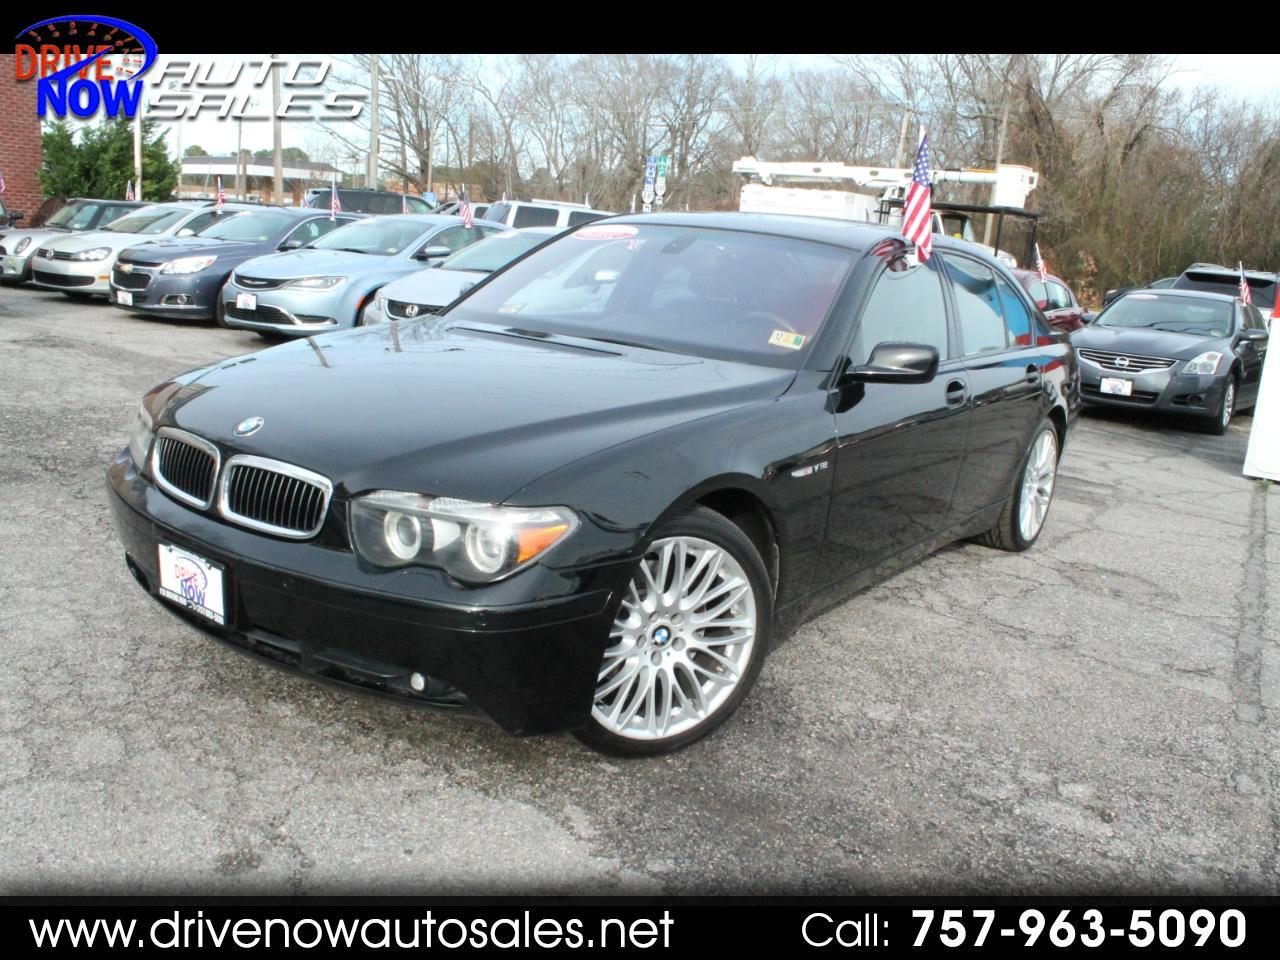 2004 BMW 7-Series 760i